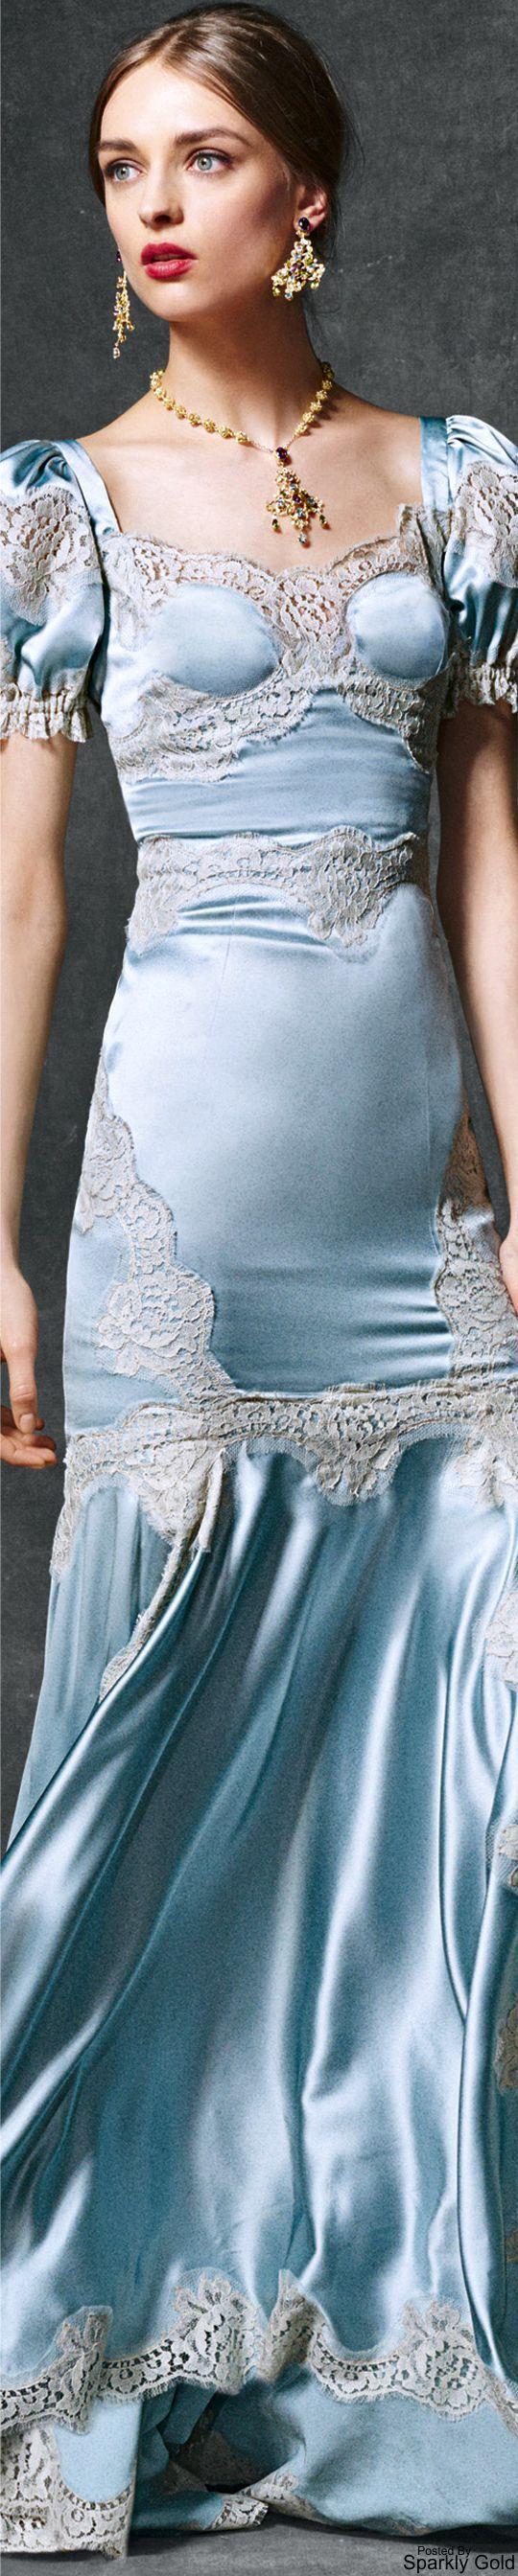 417 best {Dolce & Gabbana} images on Pinterest   Trapillo, Animal ...